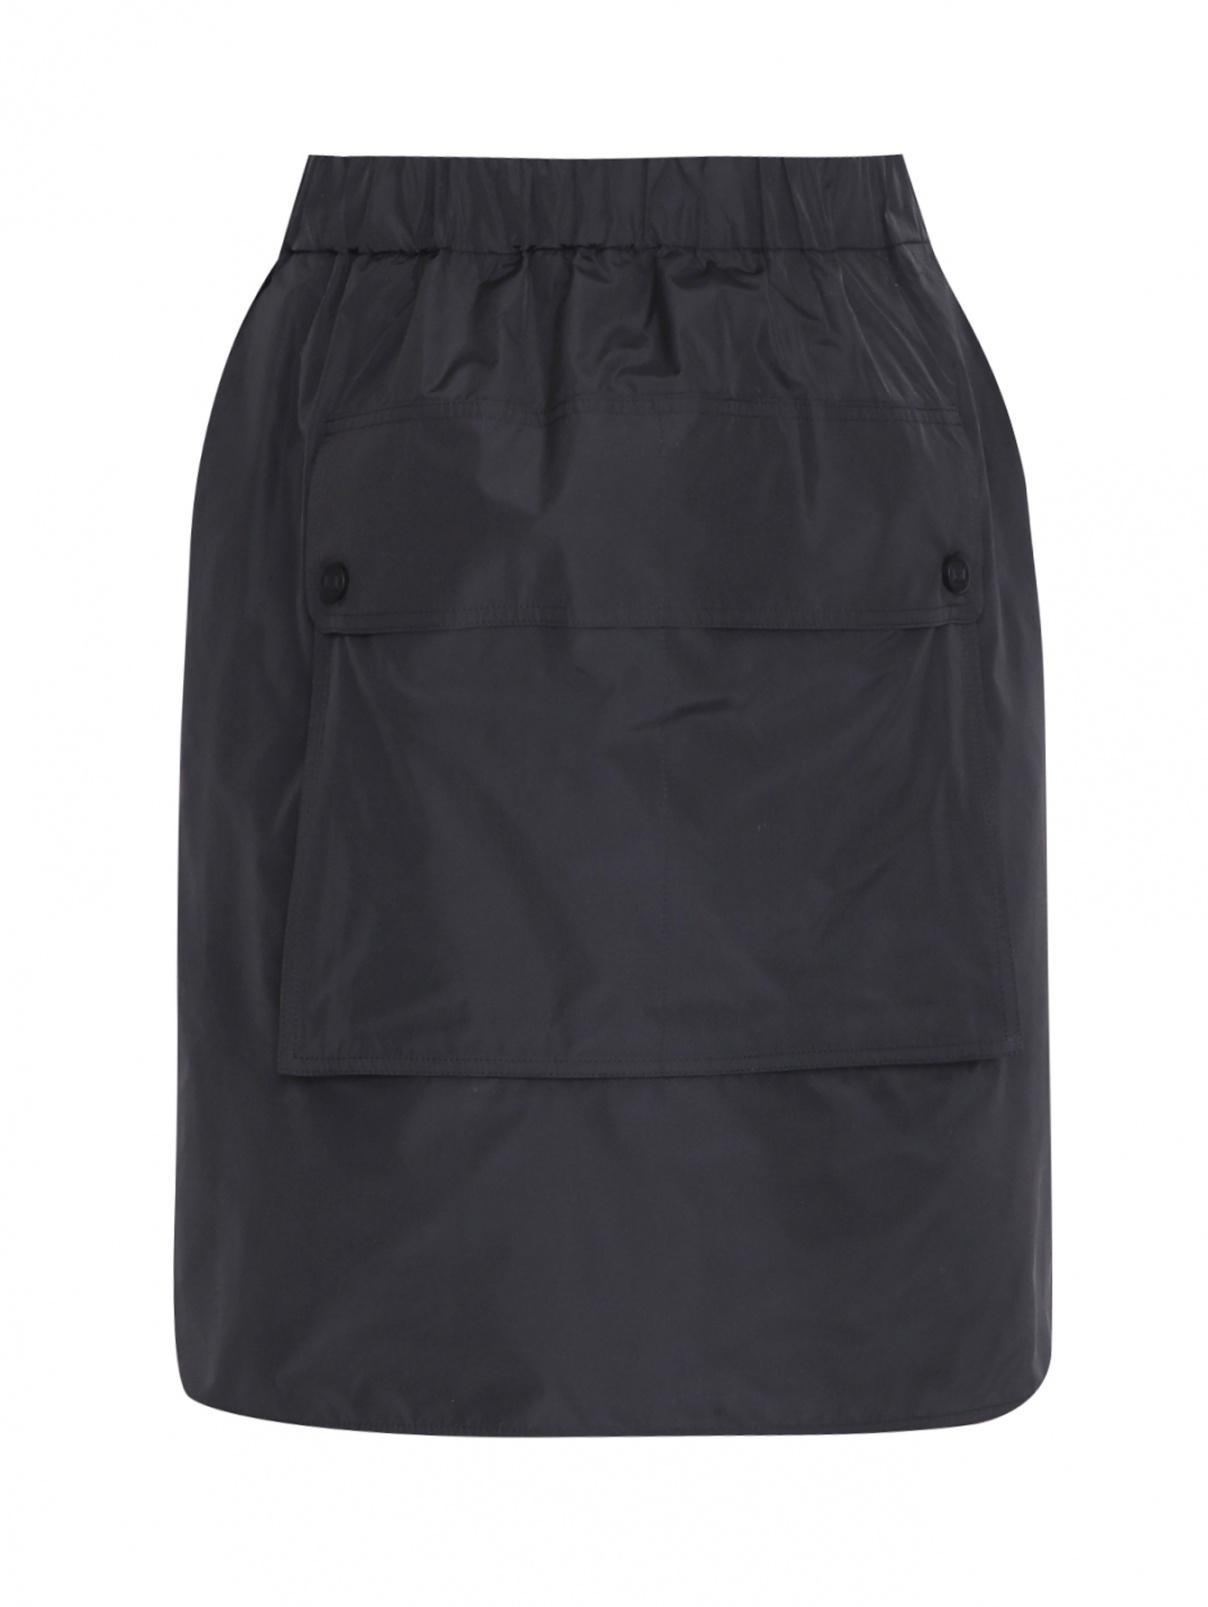 Юбка-мини на резинке с накладным карманом Max Mara  –  Общий вид